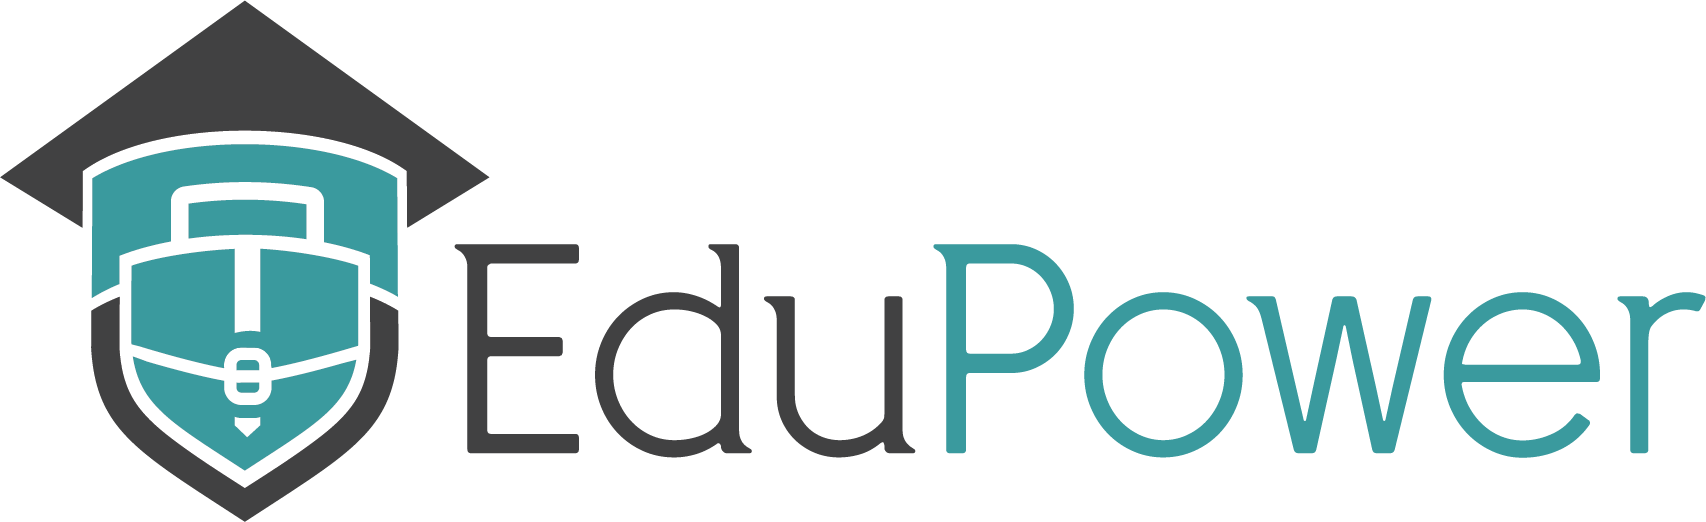 Edupower